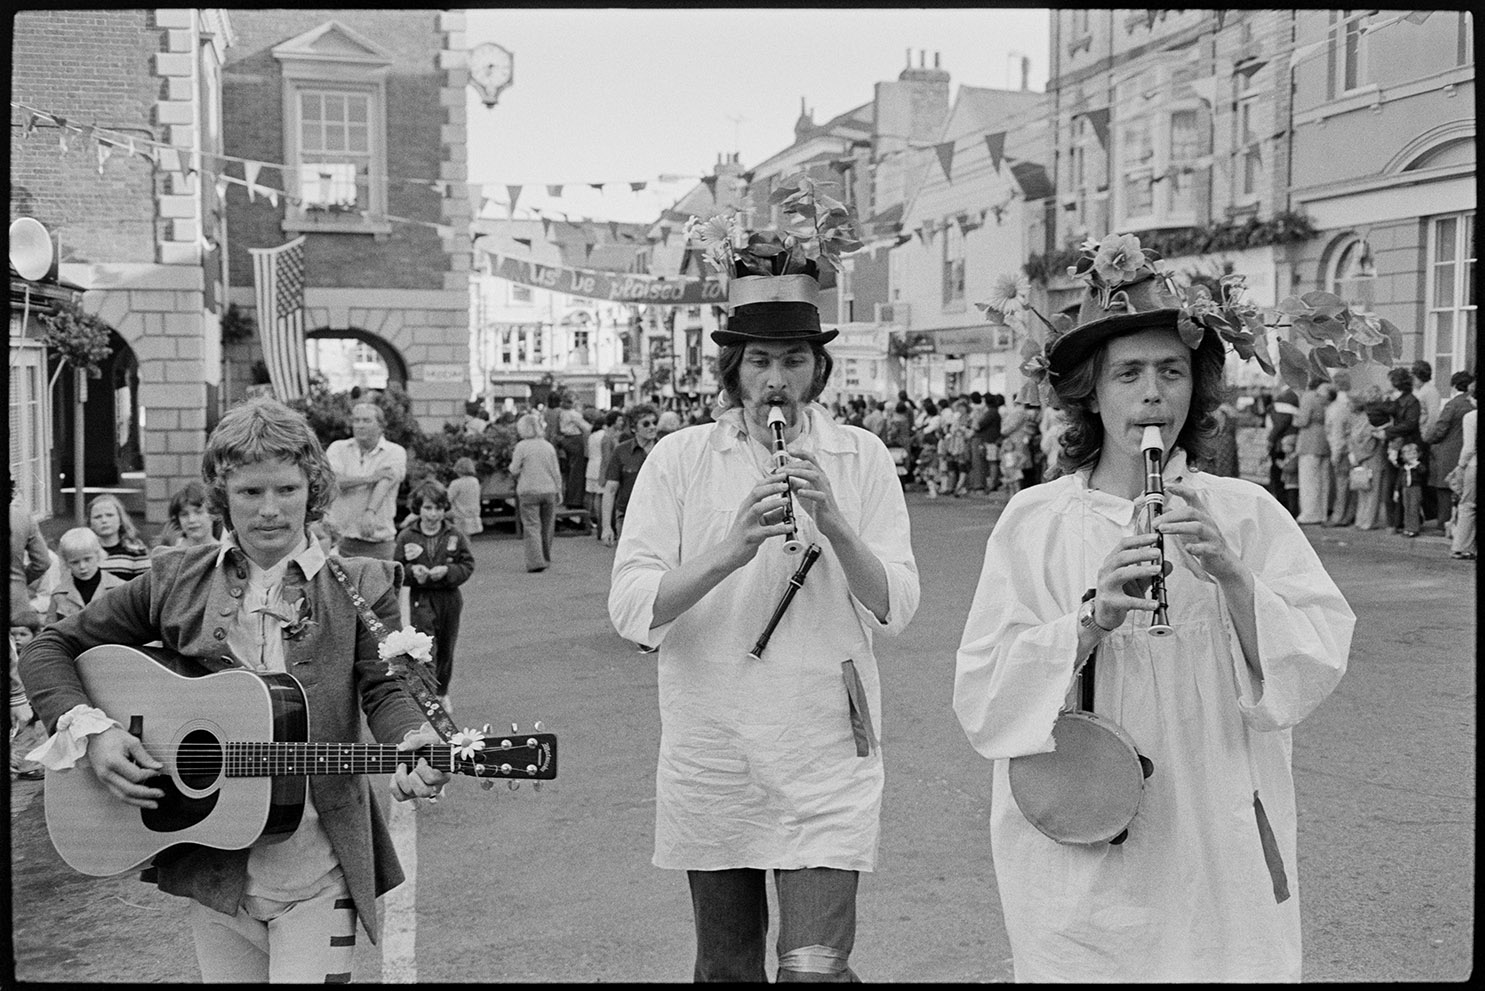 Torrington May Fair, Torrington, 5th August, 1976. Documentary photograph by James Ravilious for the Beaford Archive © Beaford Arts